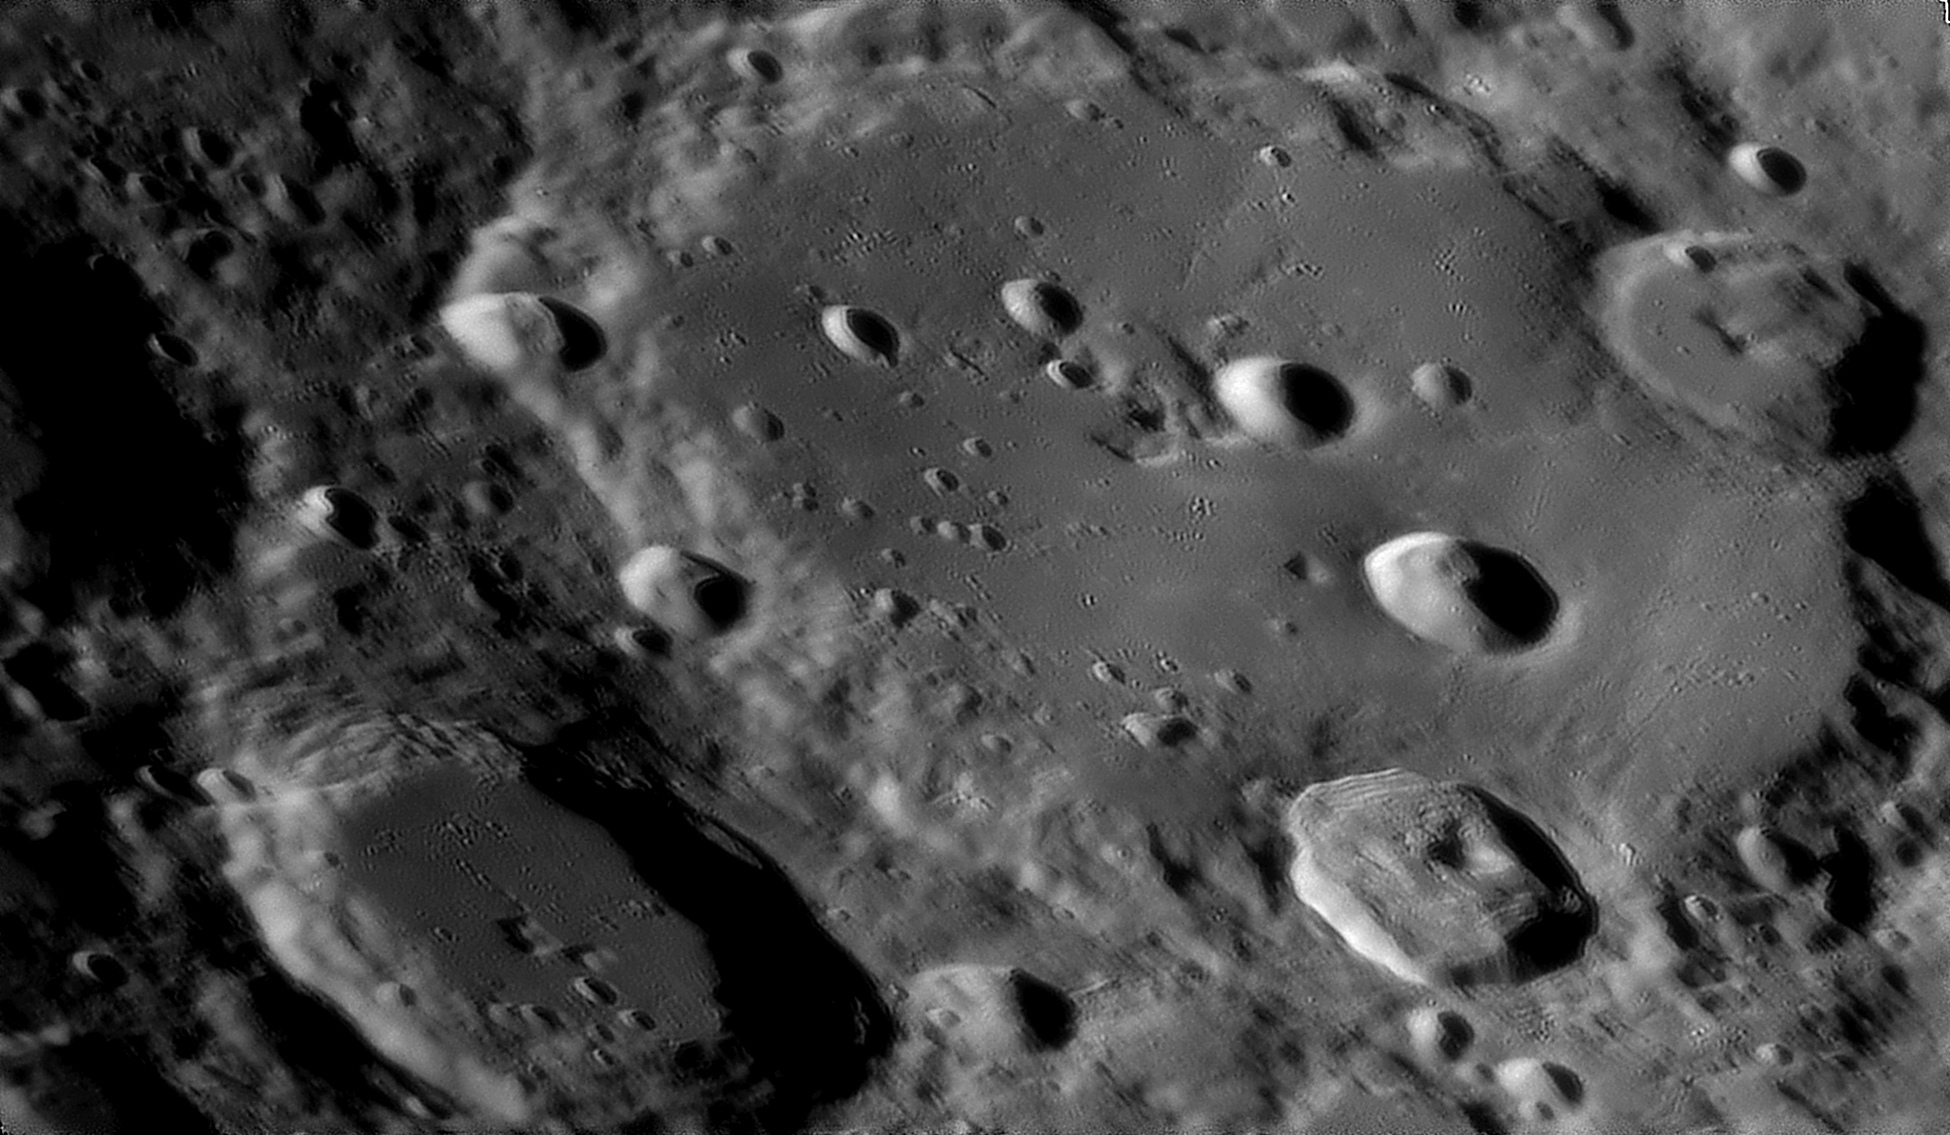 large.moon_03_04_2020_20_48_clavi.jpg.e1f9aff93be918b4c9b07de70b95b0d1.jpg